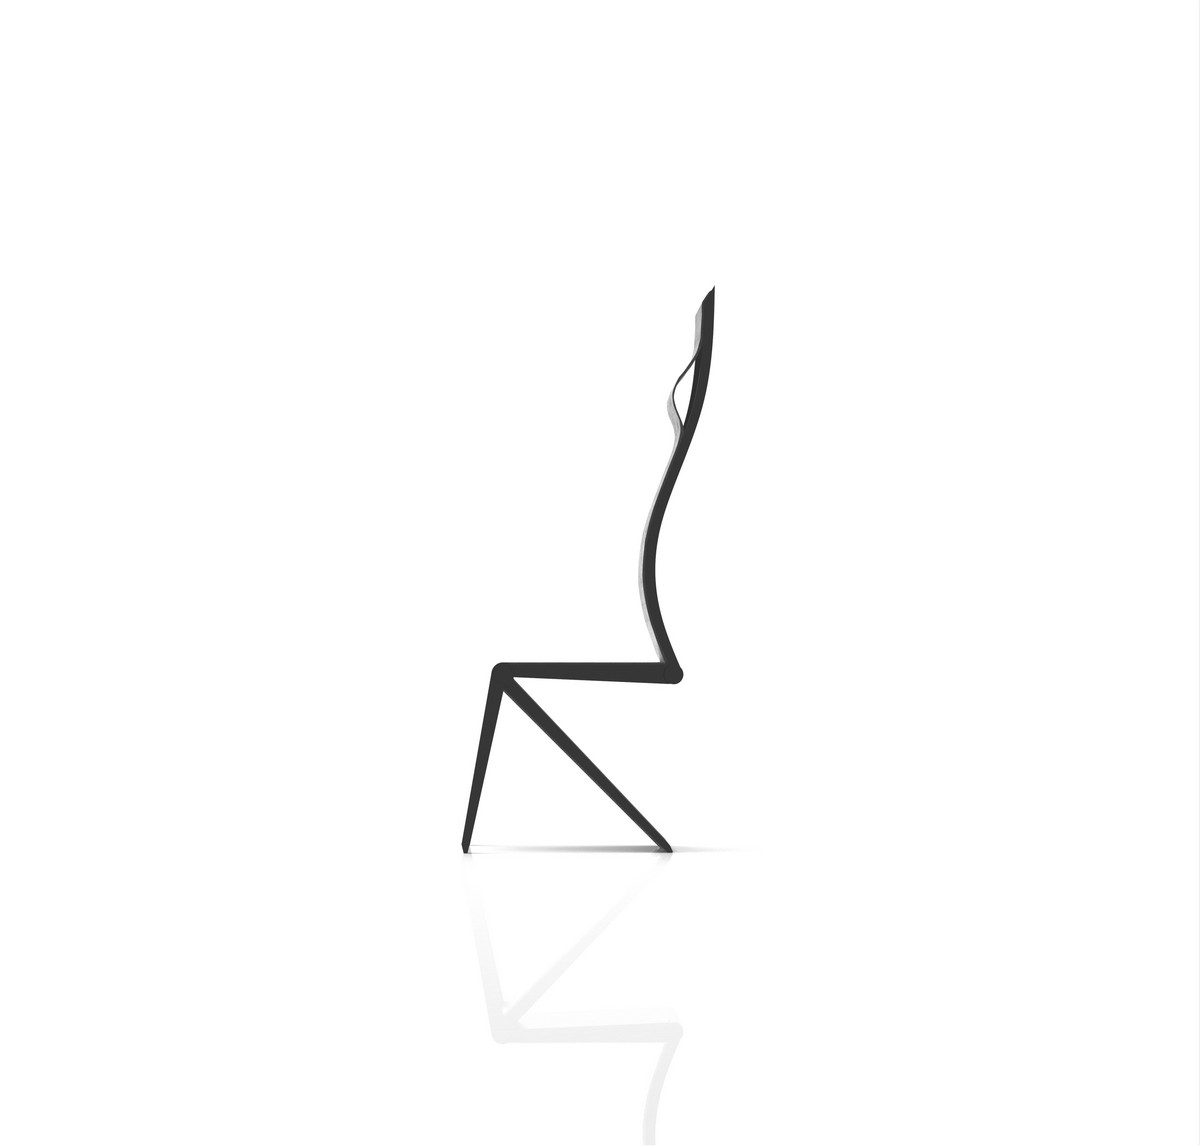 chair prostoarchitekci 2